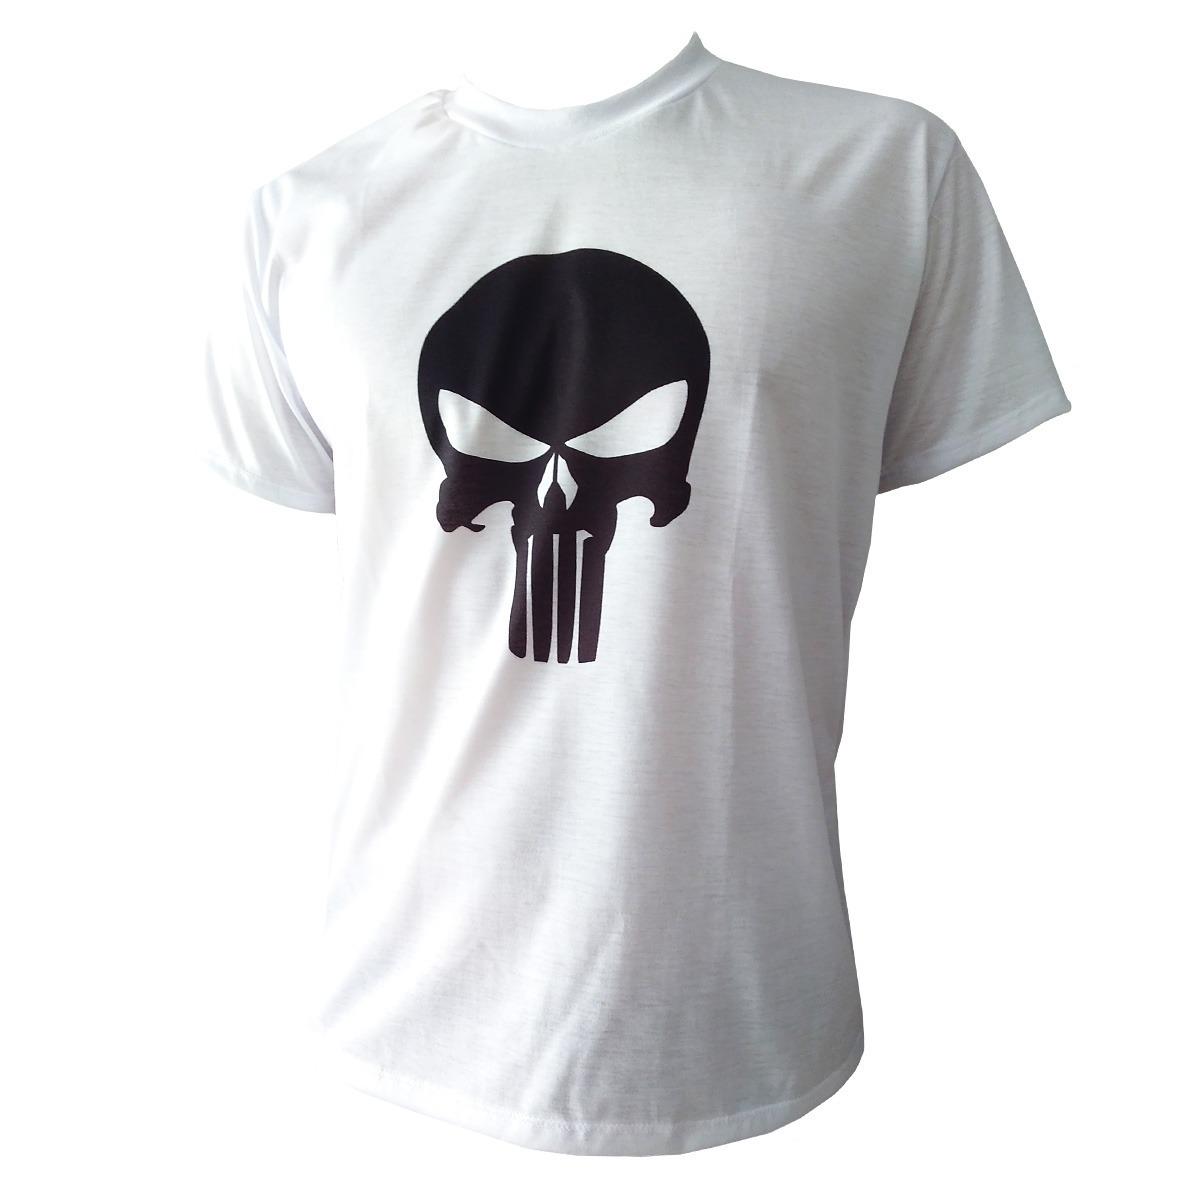 bcb1c77bfa4e1 Camiseta Justiceiro Camisa Branca The Punisher Desenho - R  29